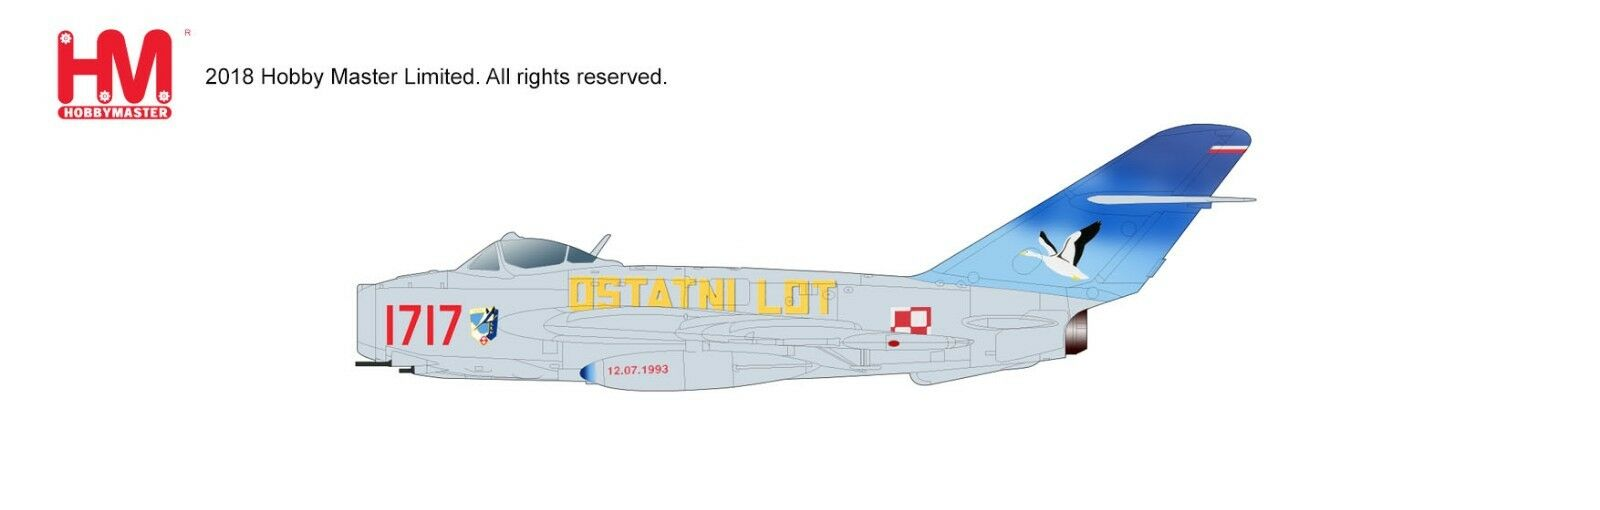 Hobby - meister ha5905, lim-5 (mig-17f), 1717, 45. experimentelle luftfahrt - staffel